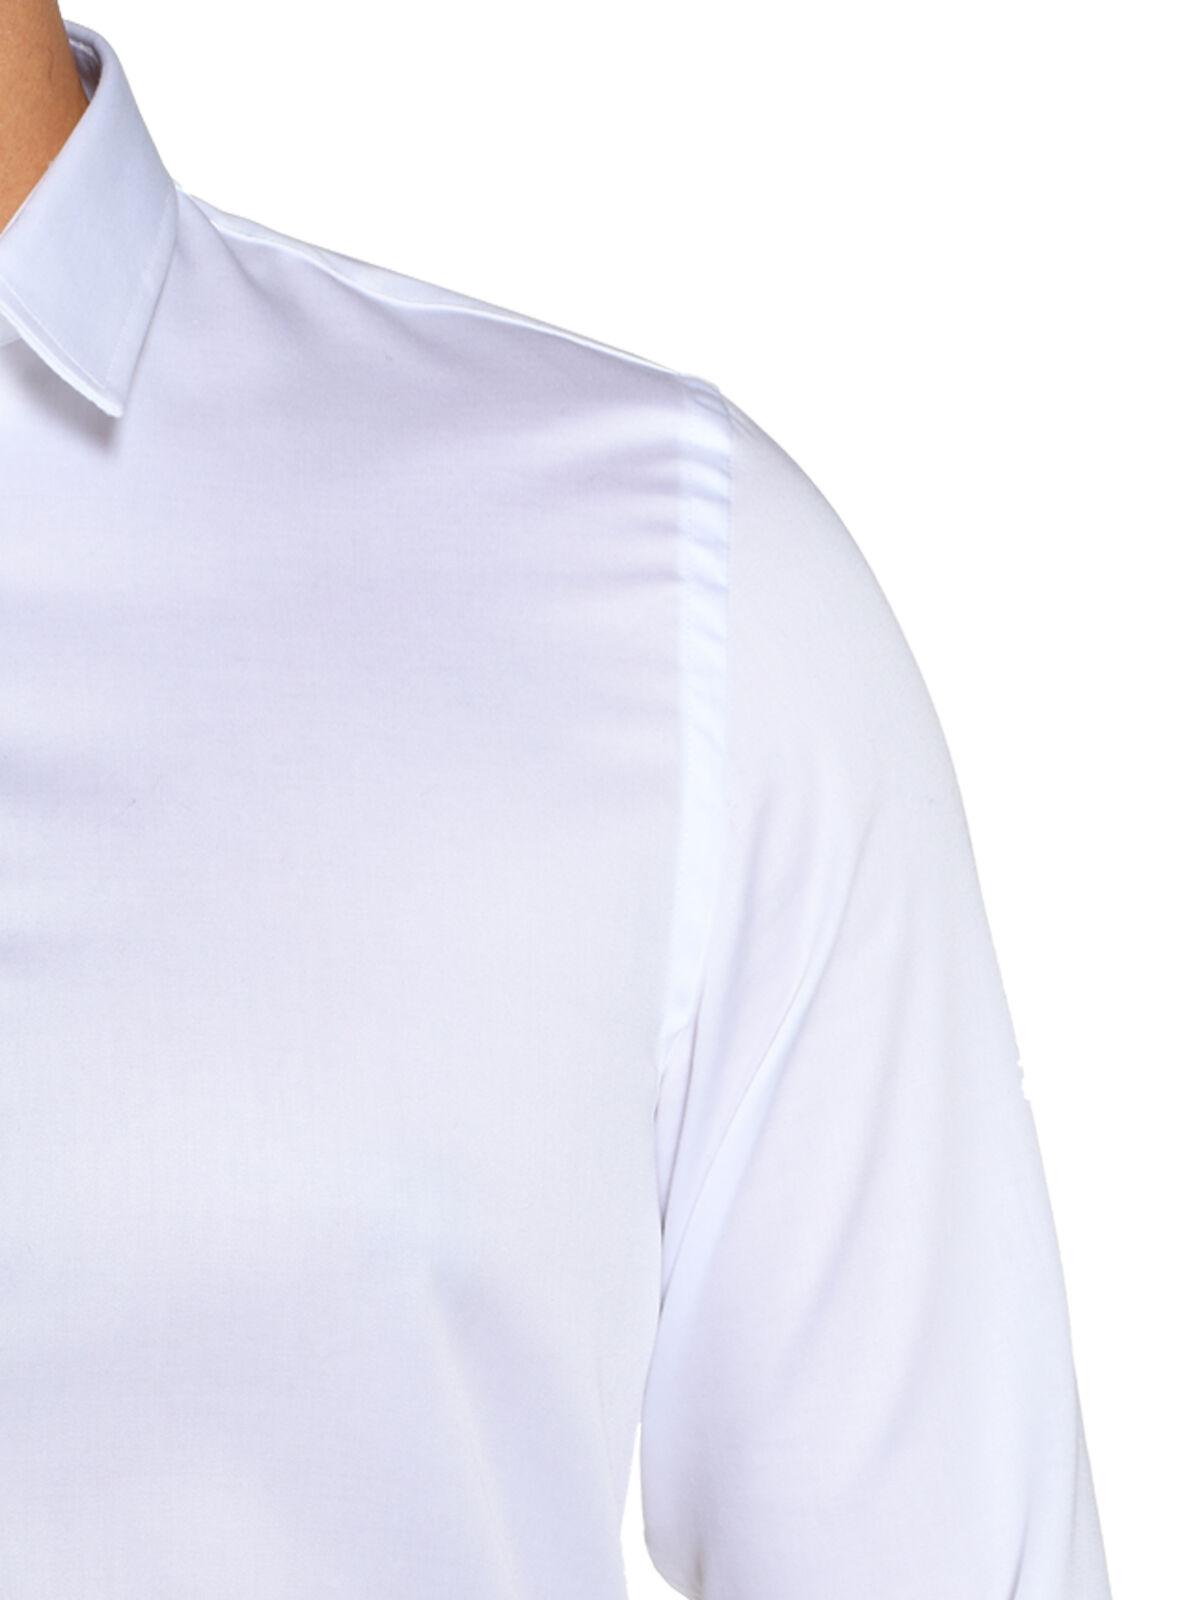 Manschettenhemd Slim Fit